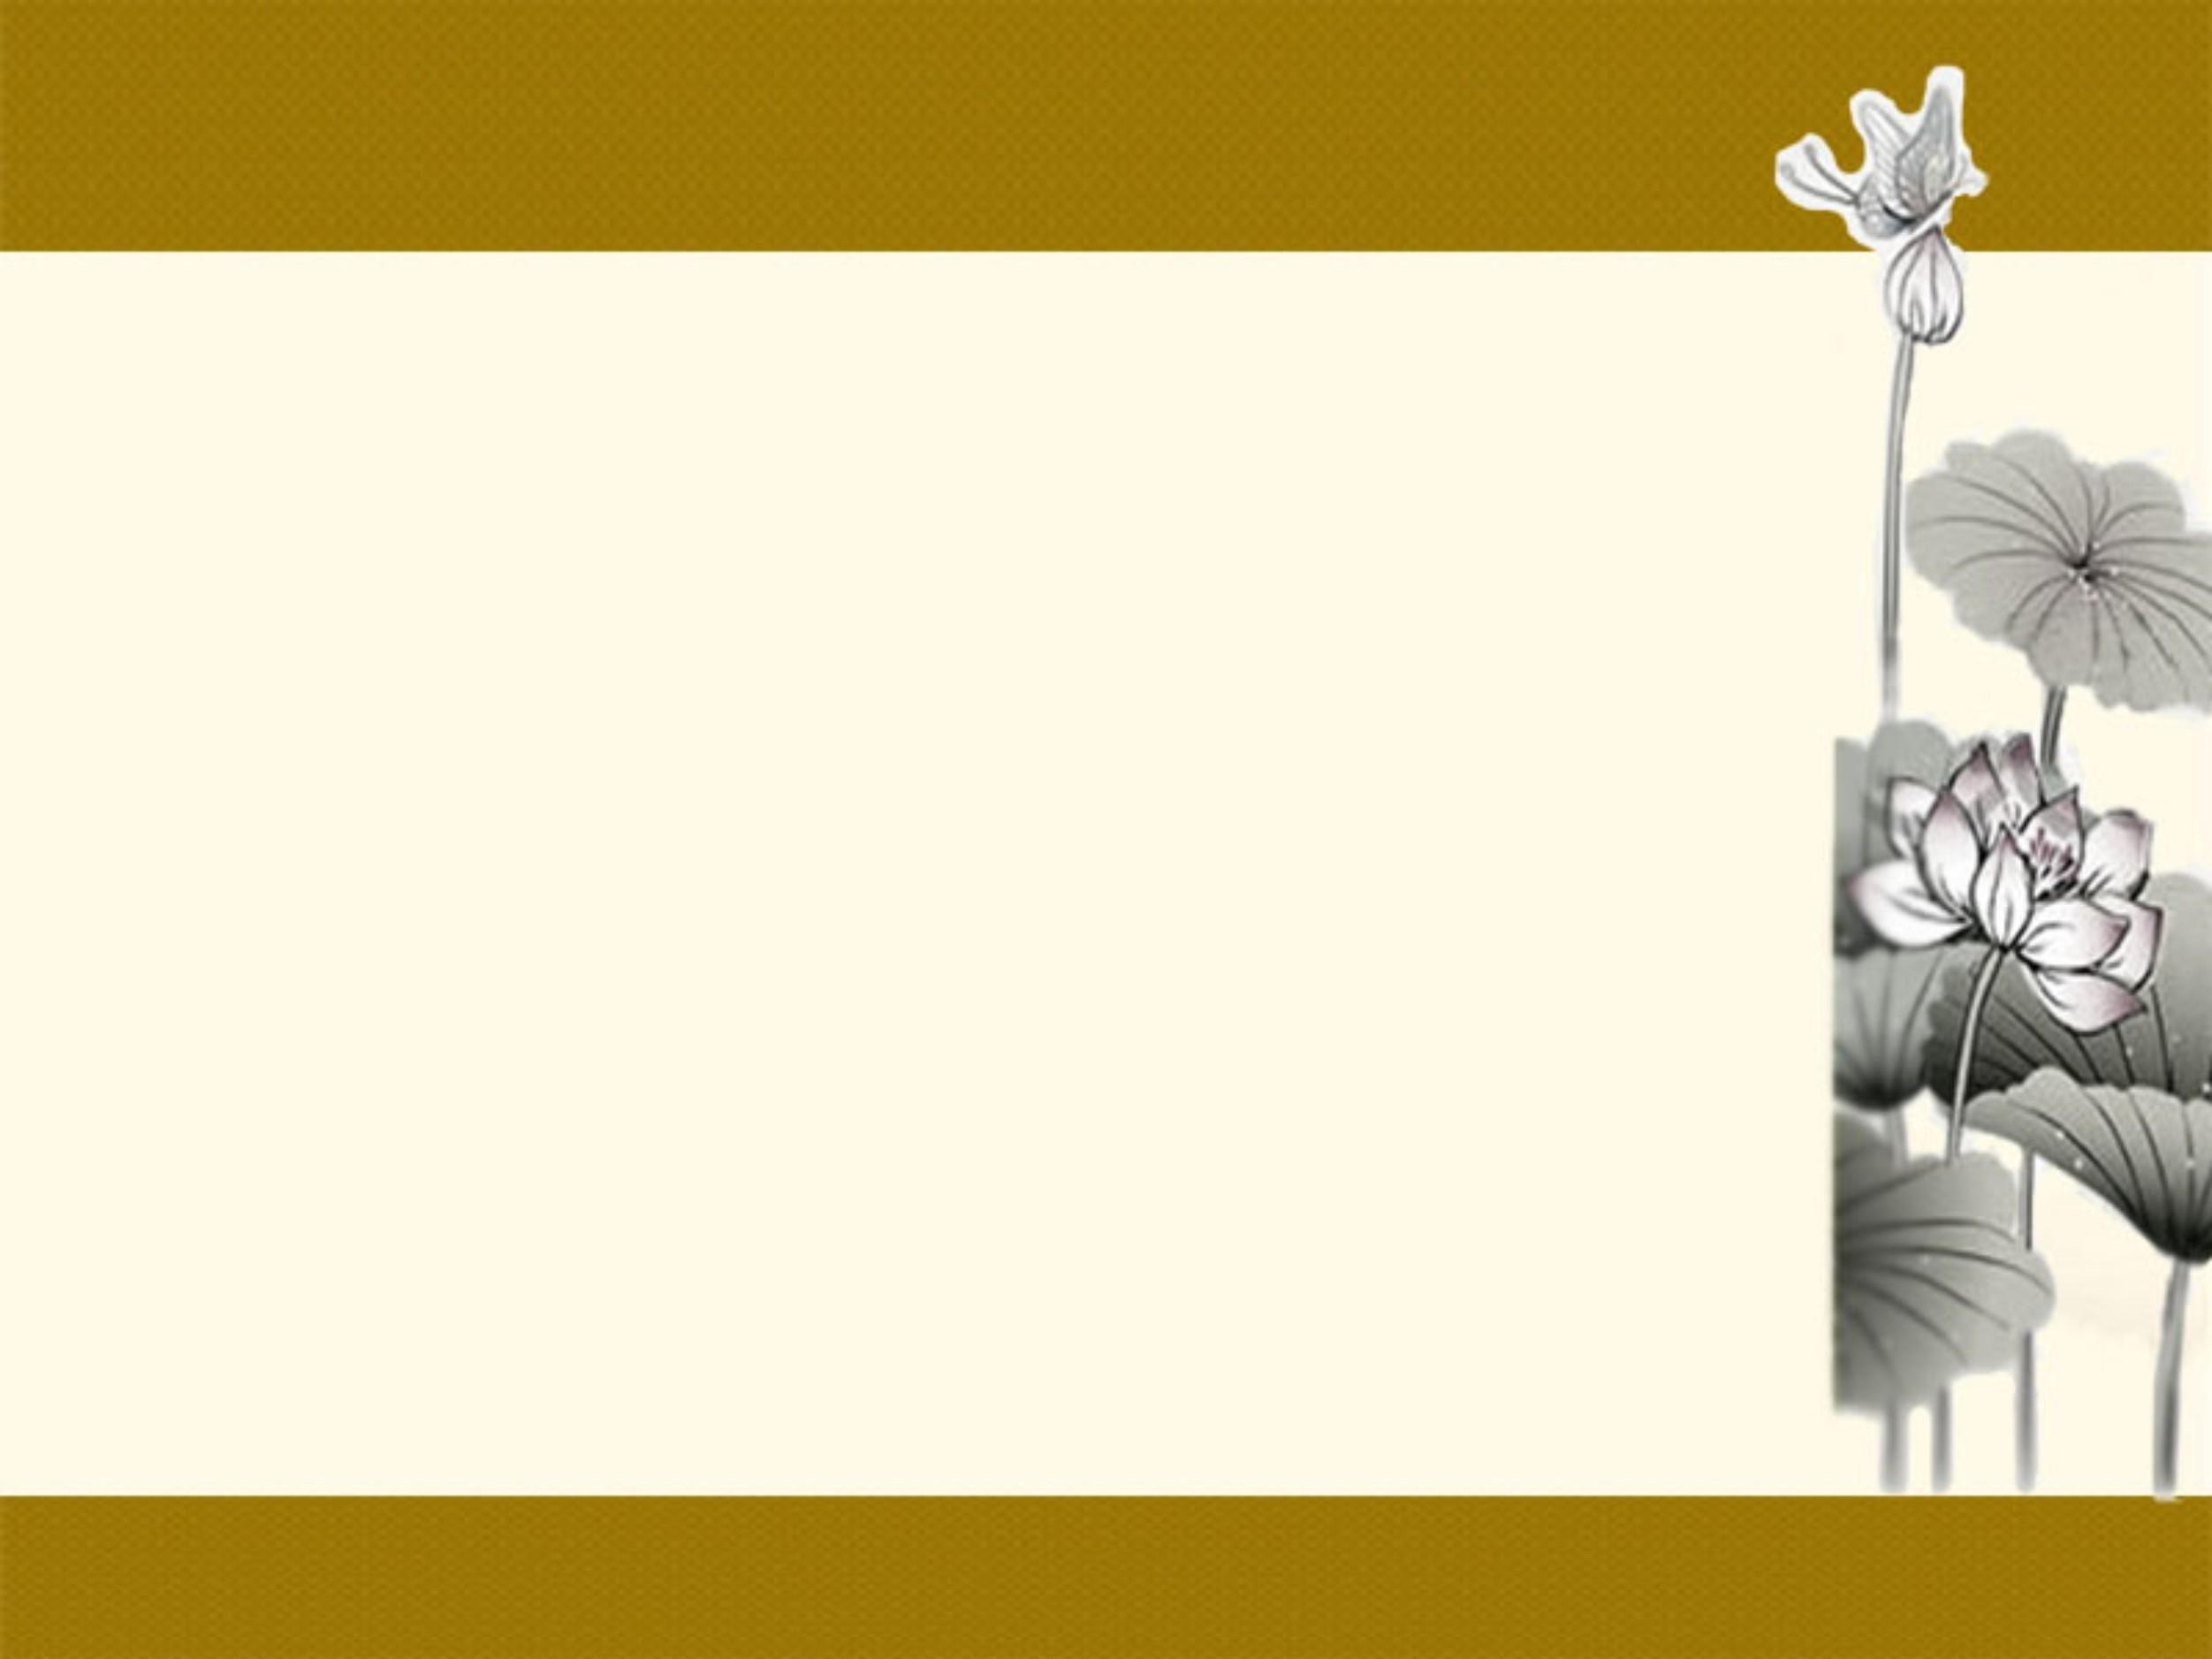 ppt 背景 背景图片 壁纸 边框 模板 设计 相框 2503_1877